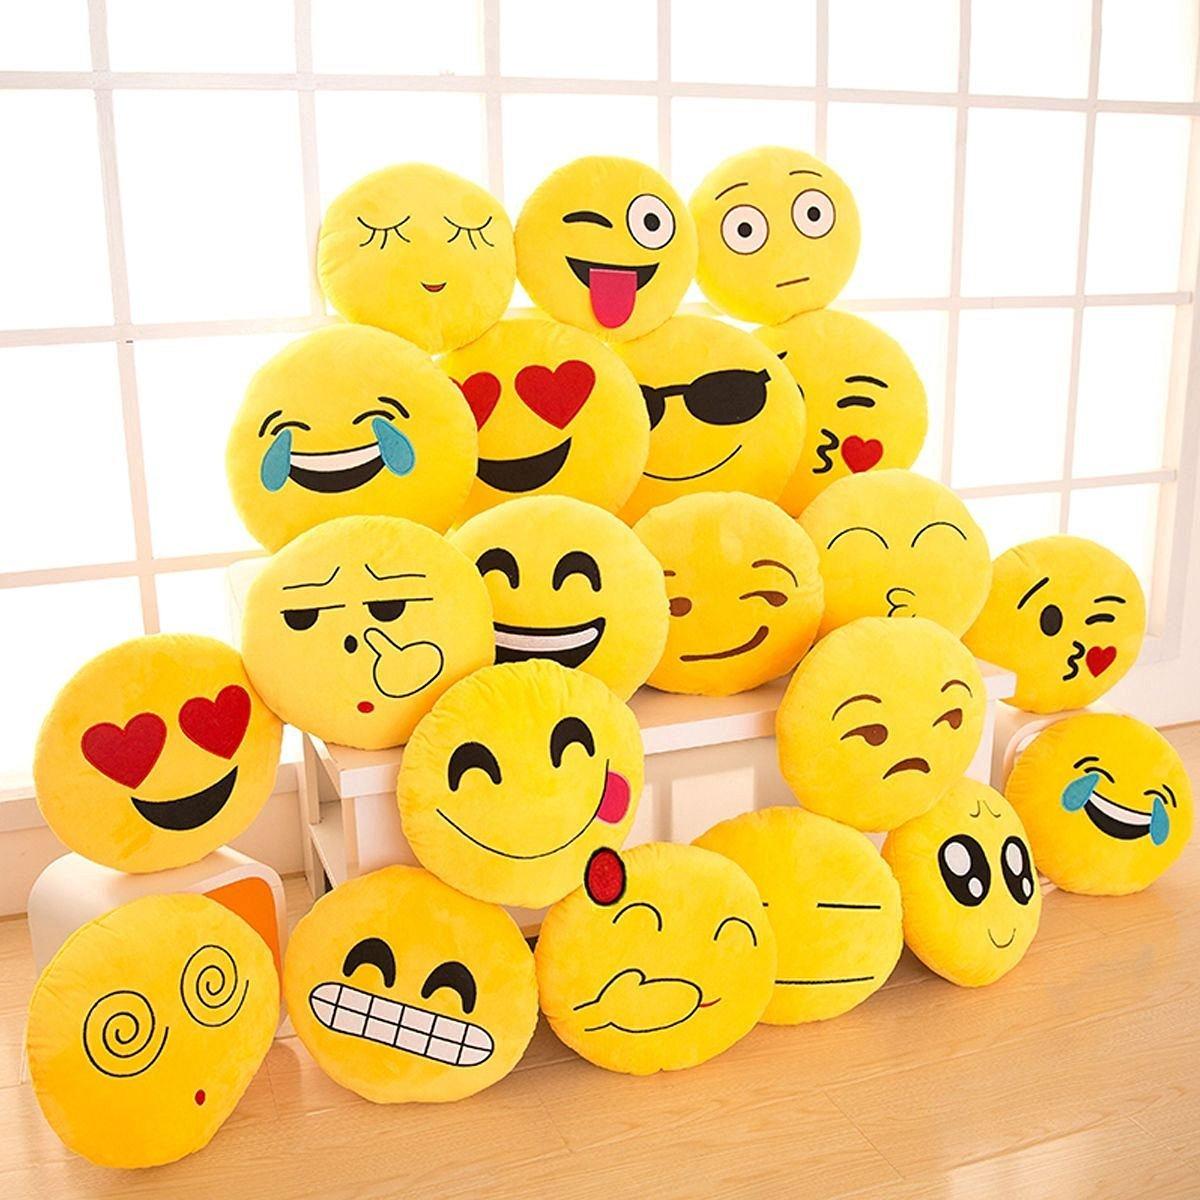 14'' Emoji Pillow (set of 12) Assorted Emojis